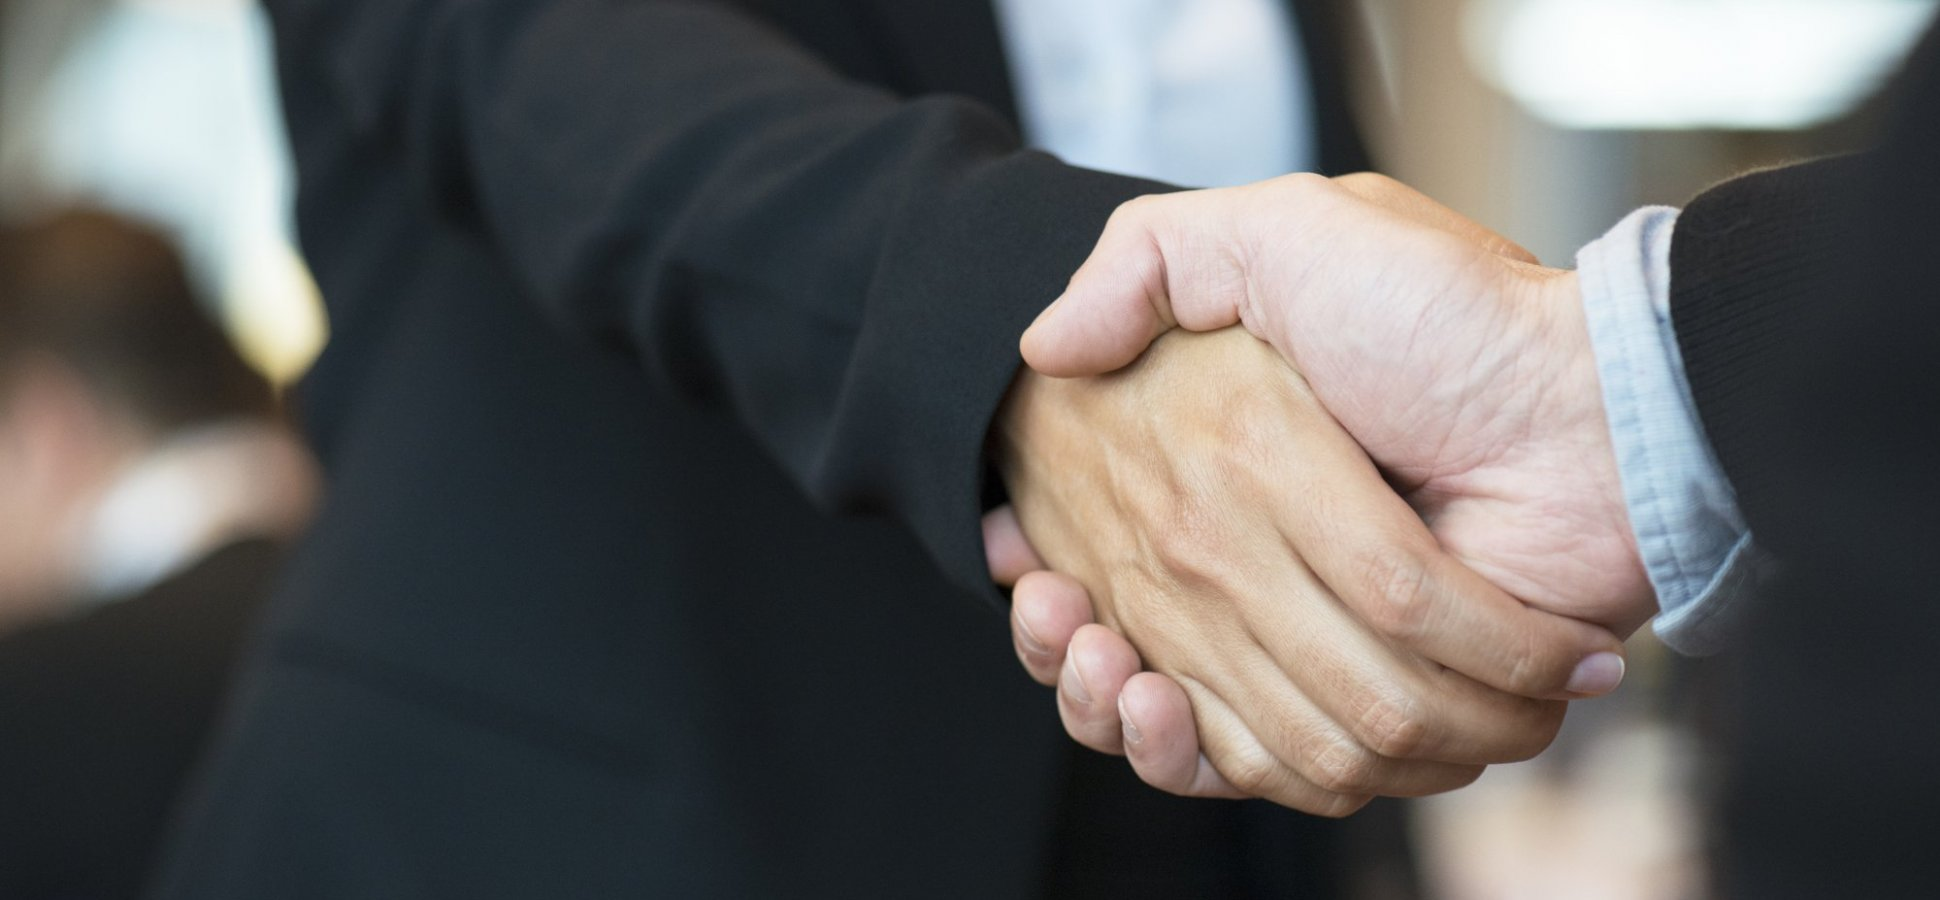 3 Secrets Every Successful Negotiator Knows